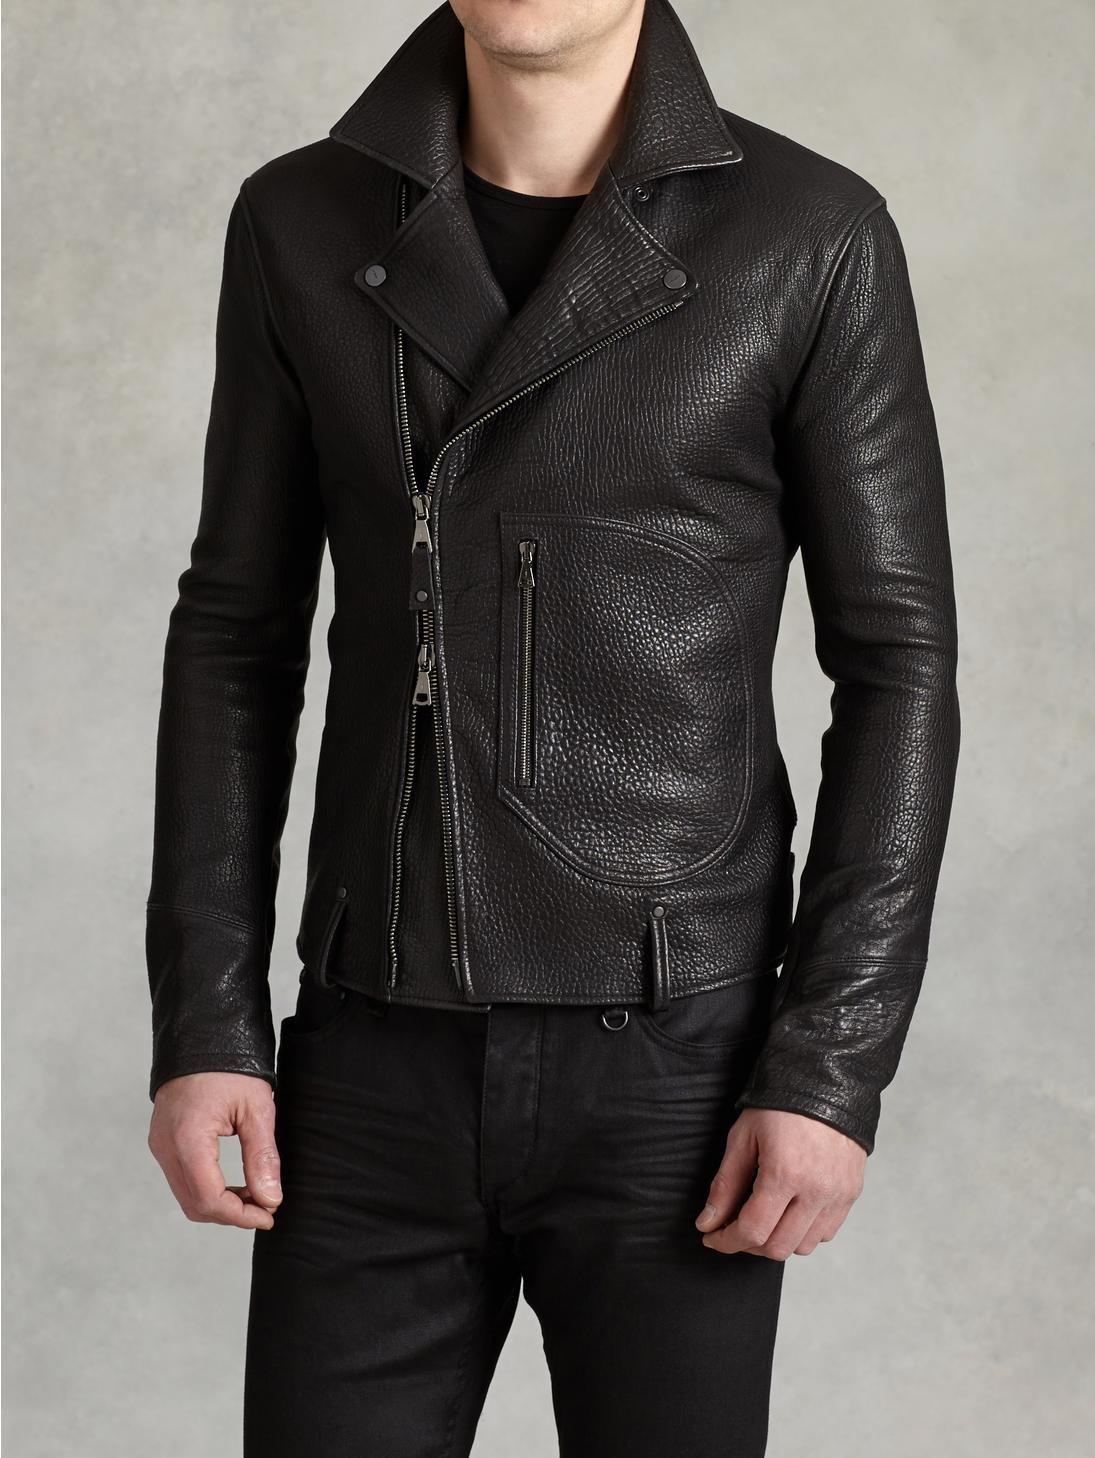 John Varvatos Leather Biker Jacket | Threads &amp Fashion | Pinterest